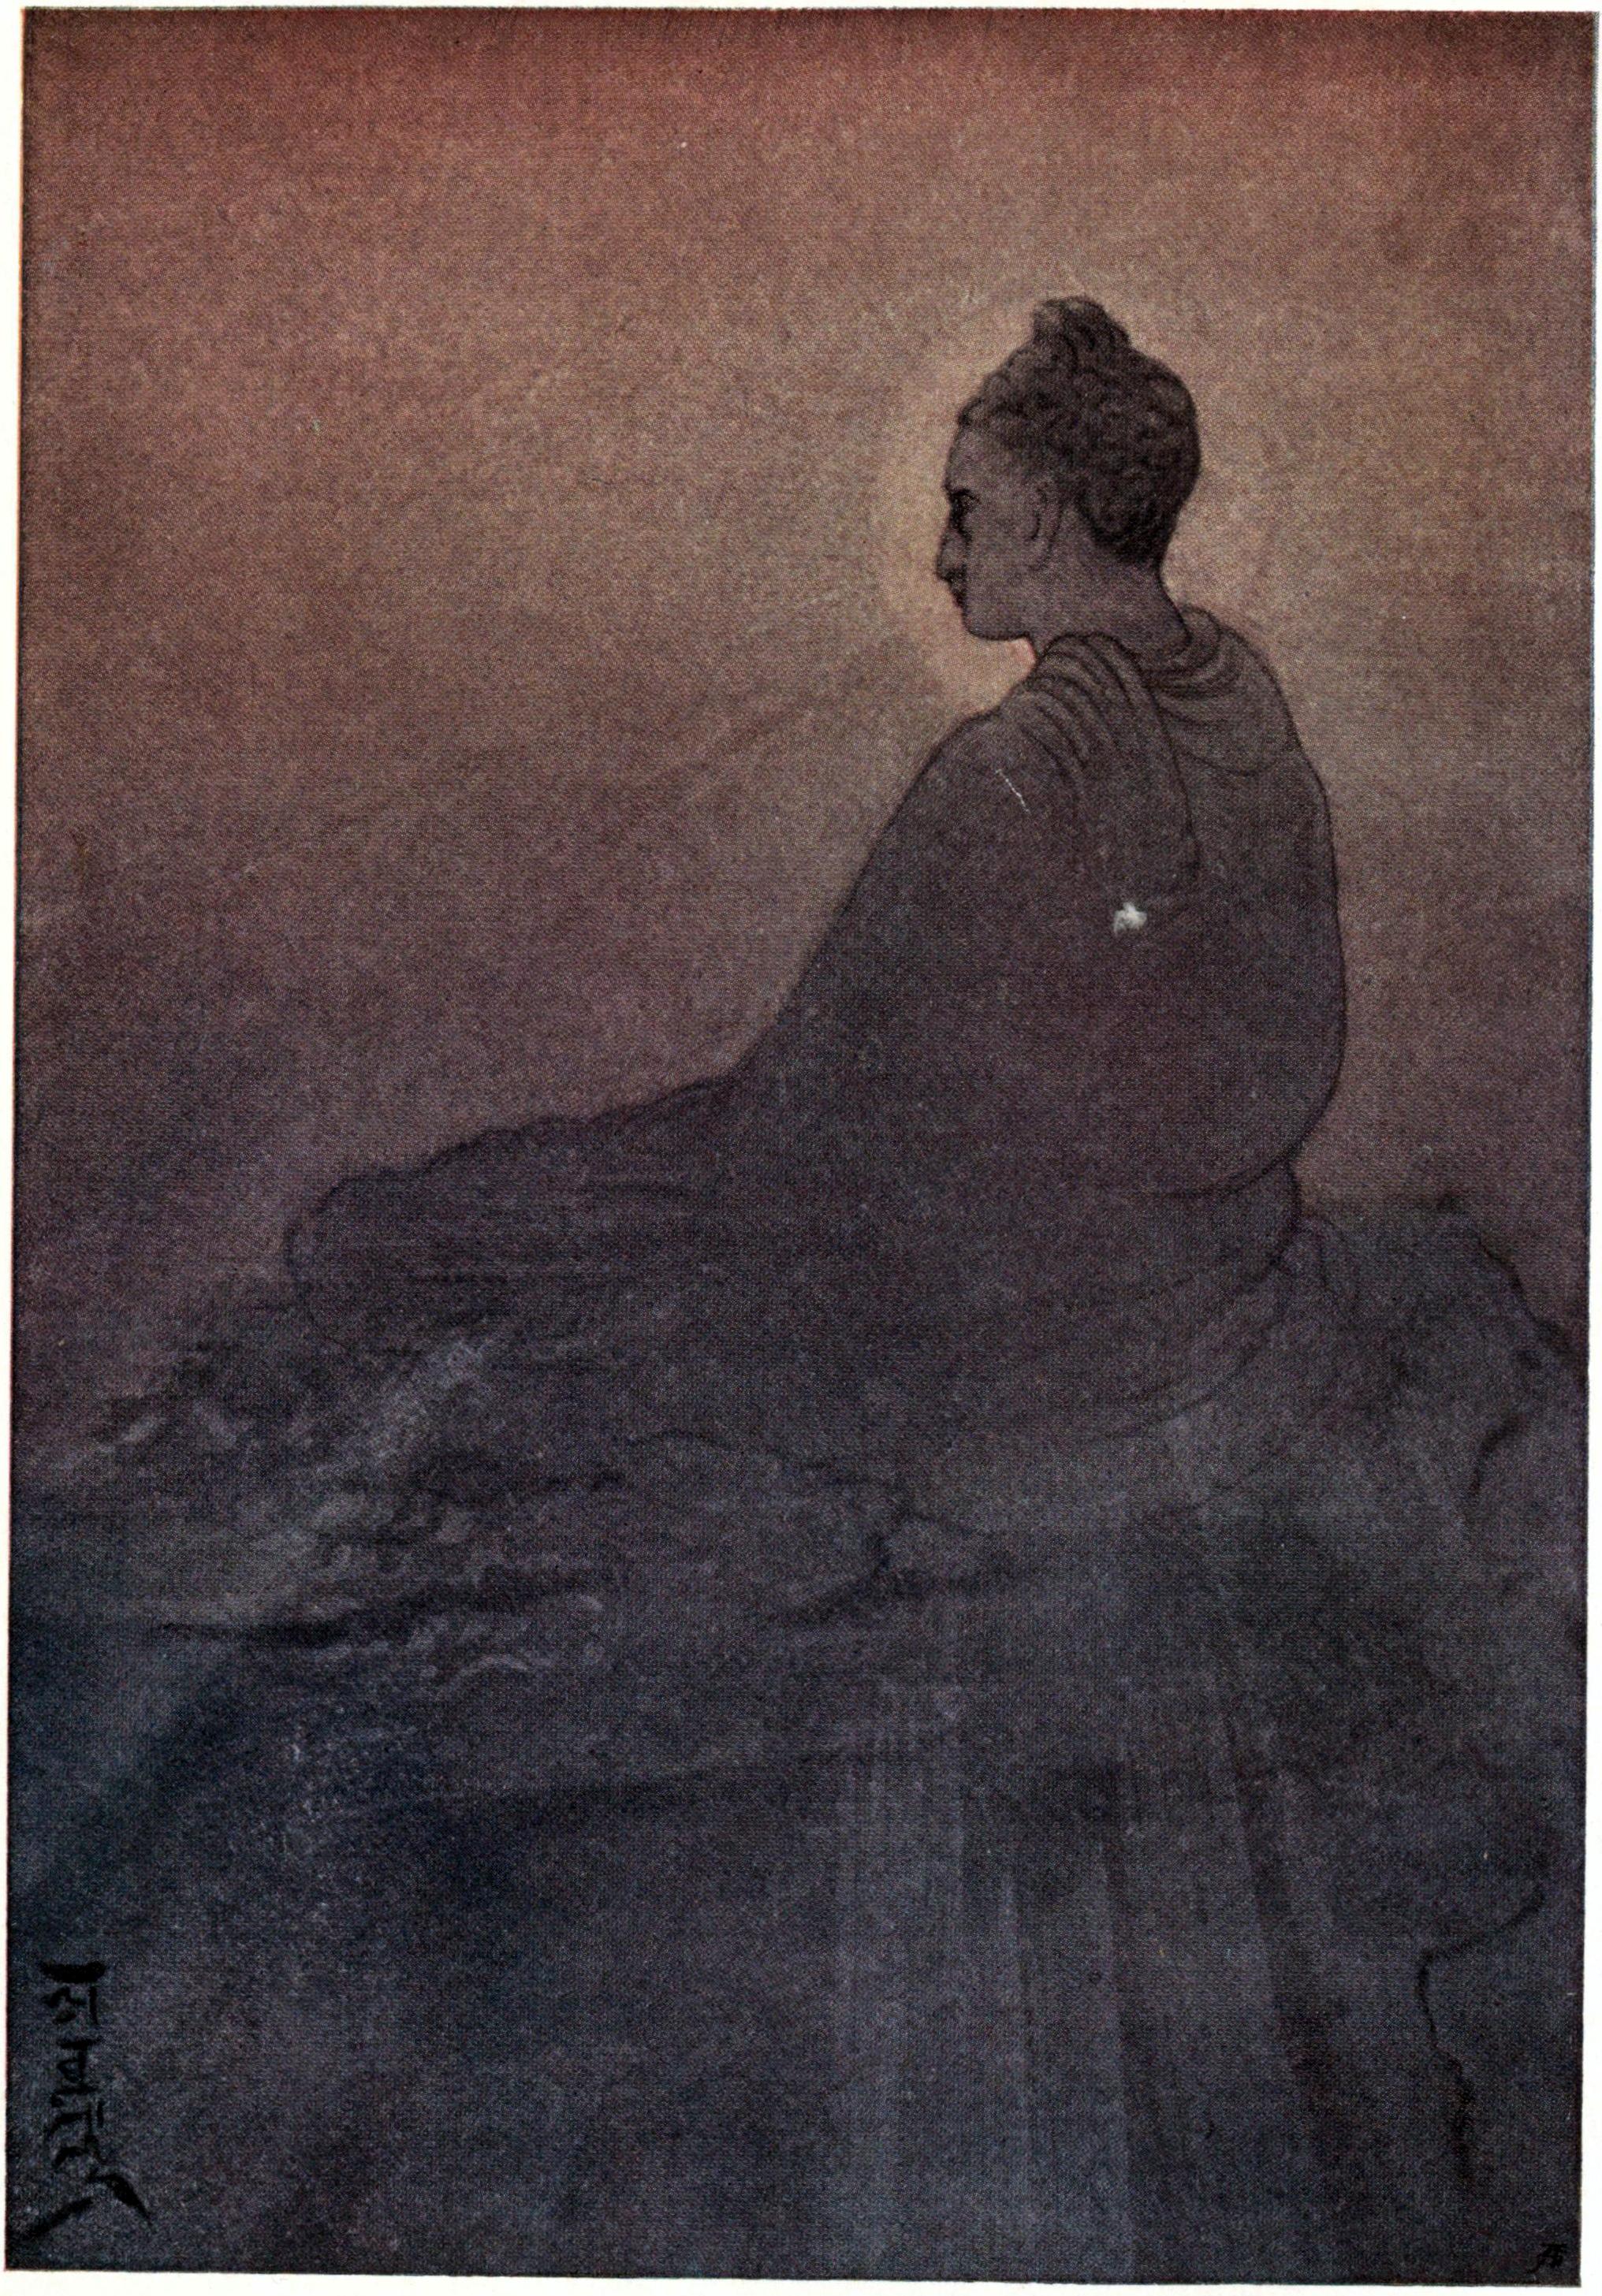 https://upload.wikimedia.org/wikipedia/commons/1/16/The_Victory_of_Buddha.jpg